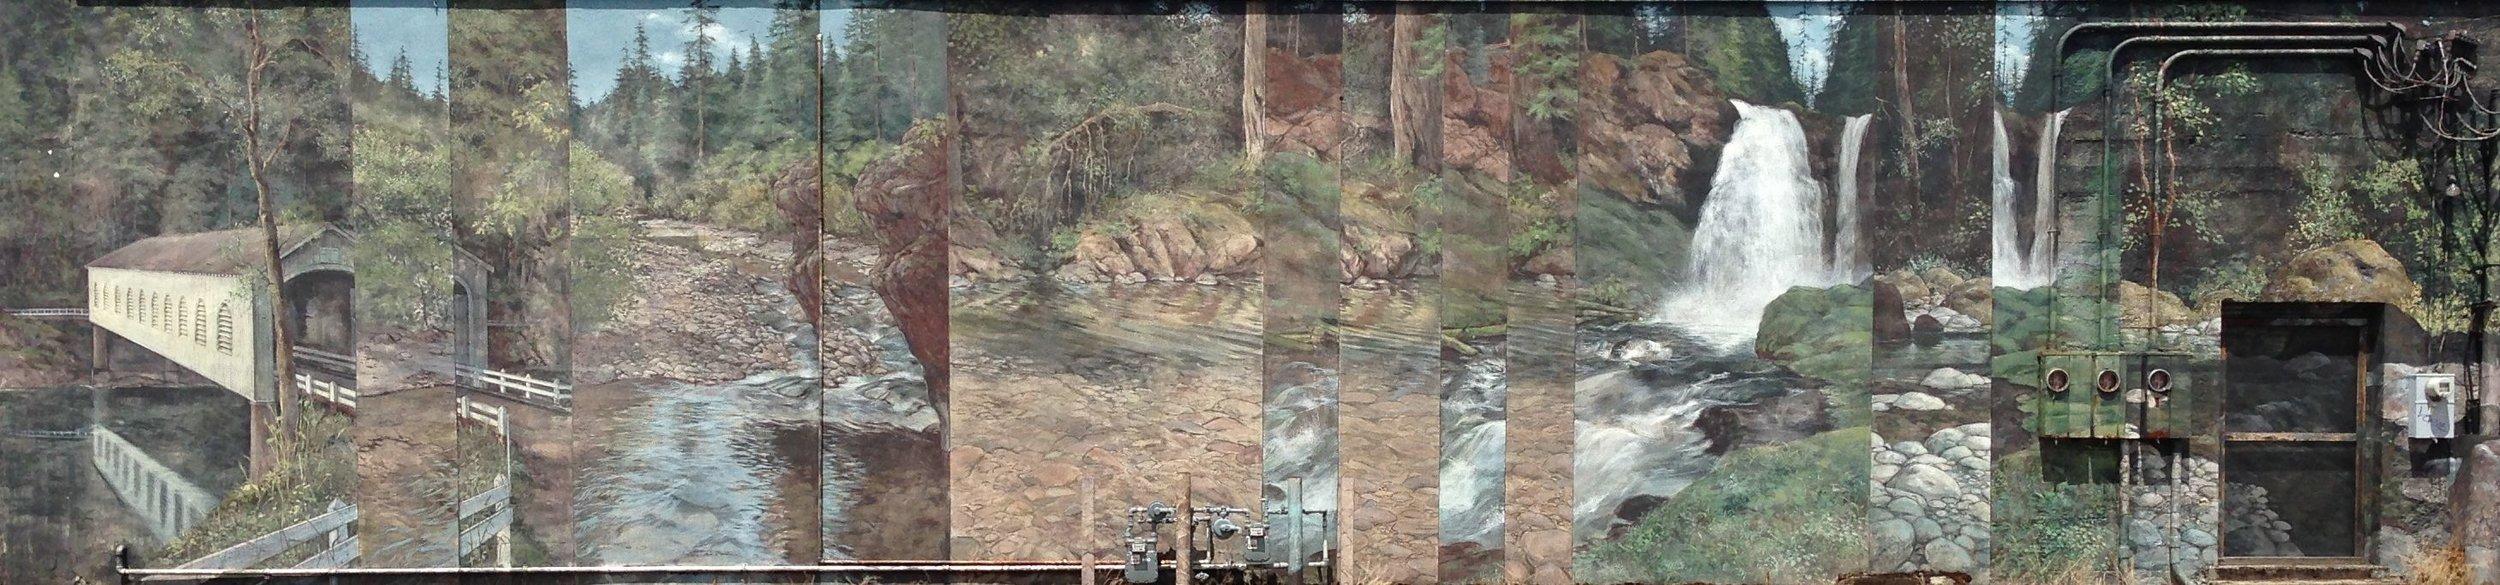 13. McKenzie River (1991), by Ann Woodruff Murray